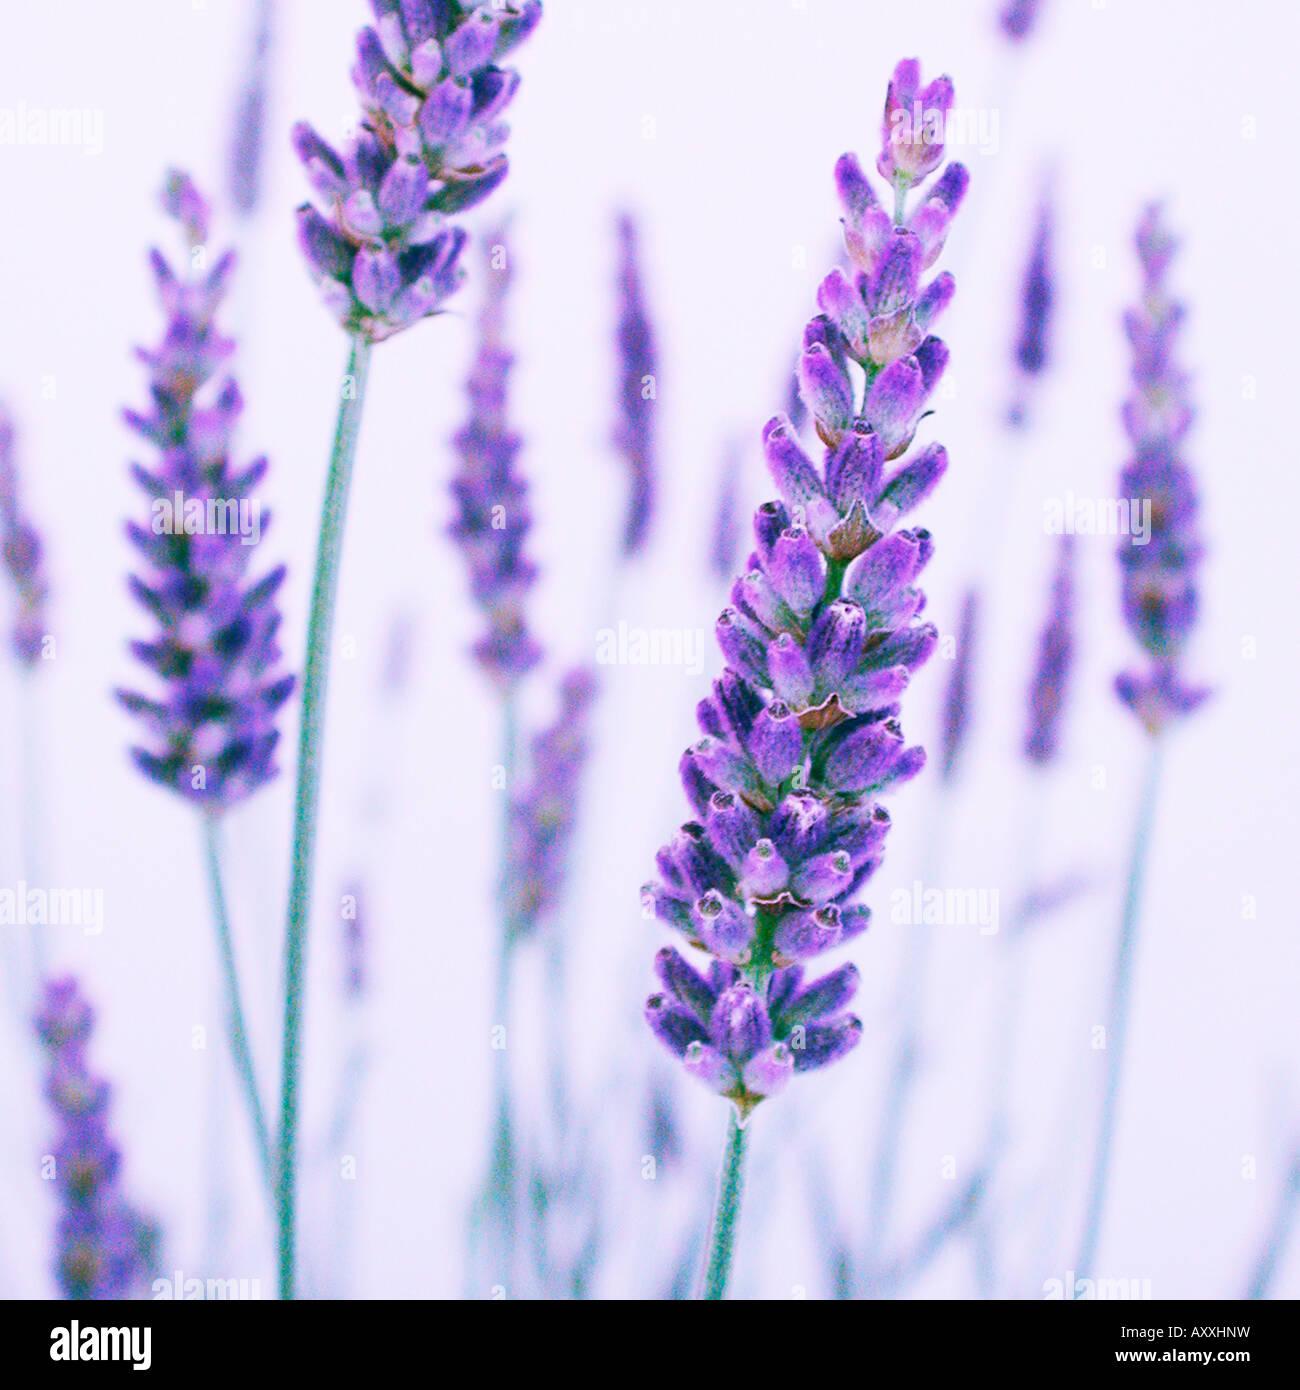 Lavendel, Lavandula, lila Blüten auf Stengeln. Stockbild